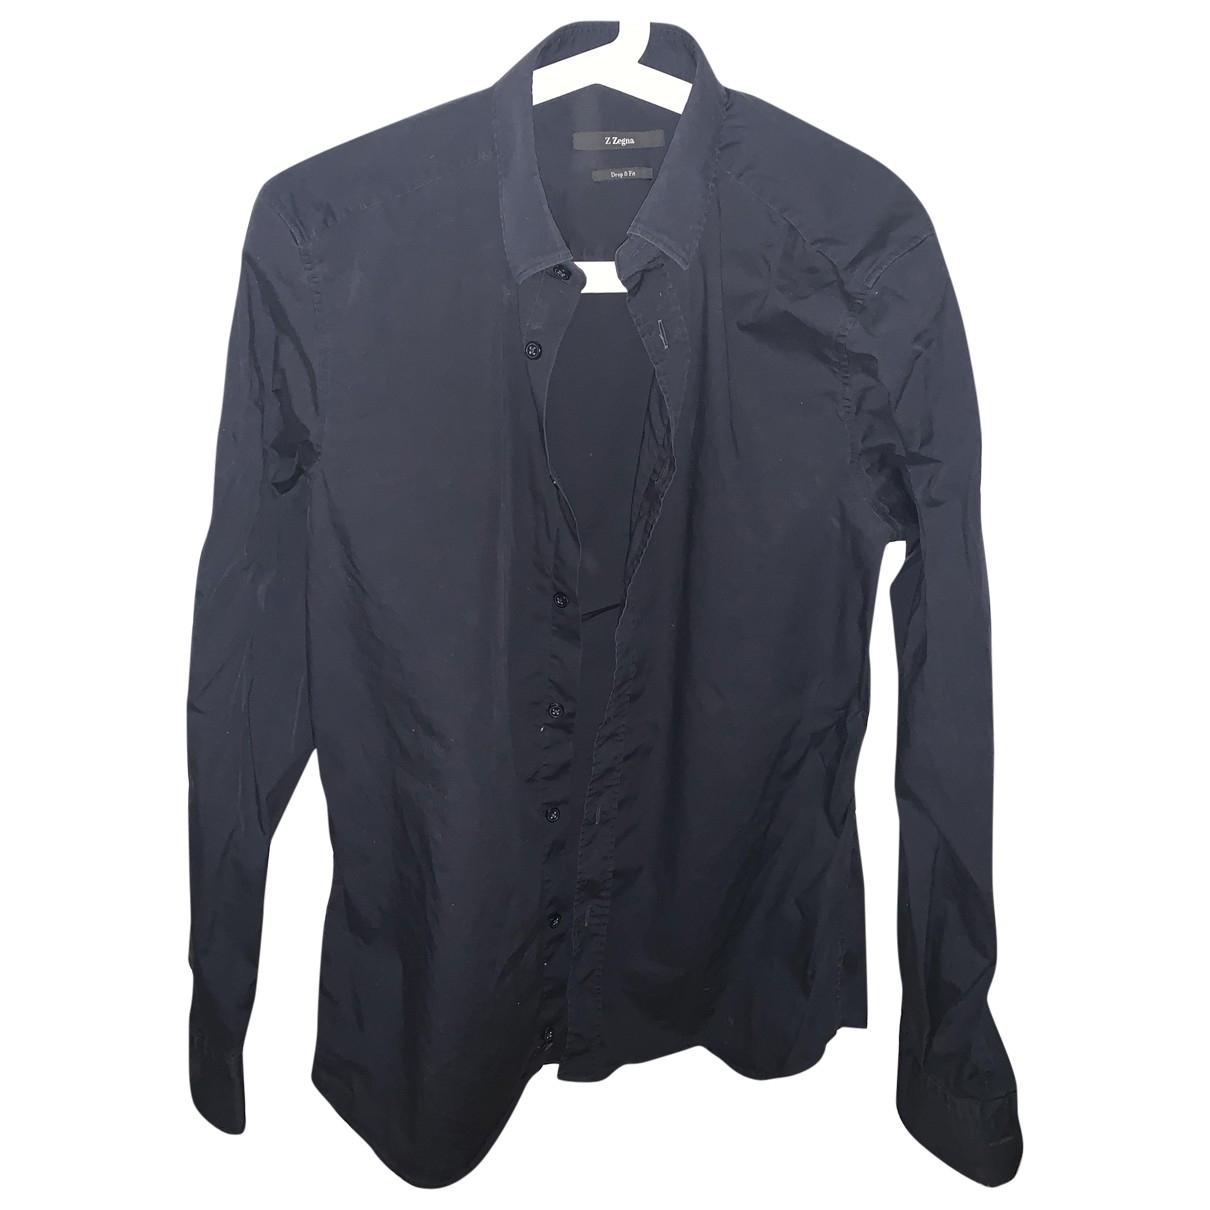 Z Zegna \N Navy Cotton Shirts for Men M International